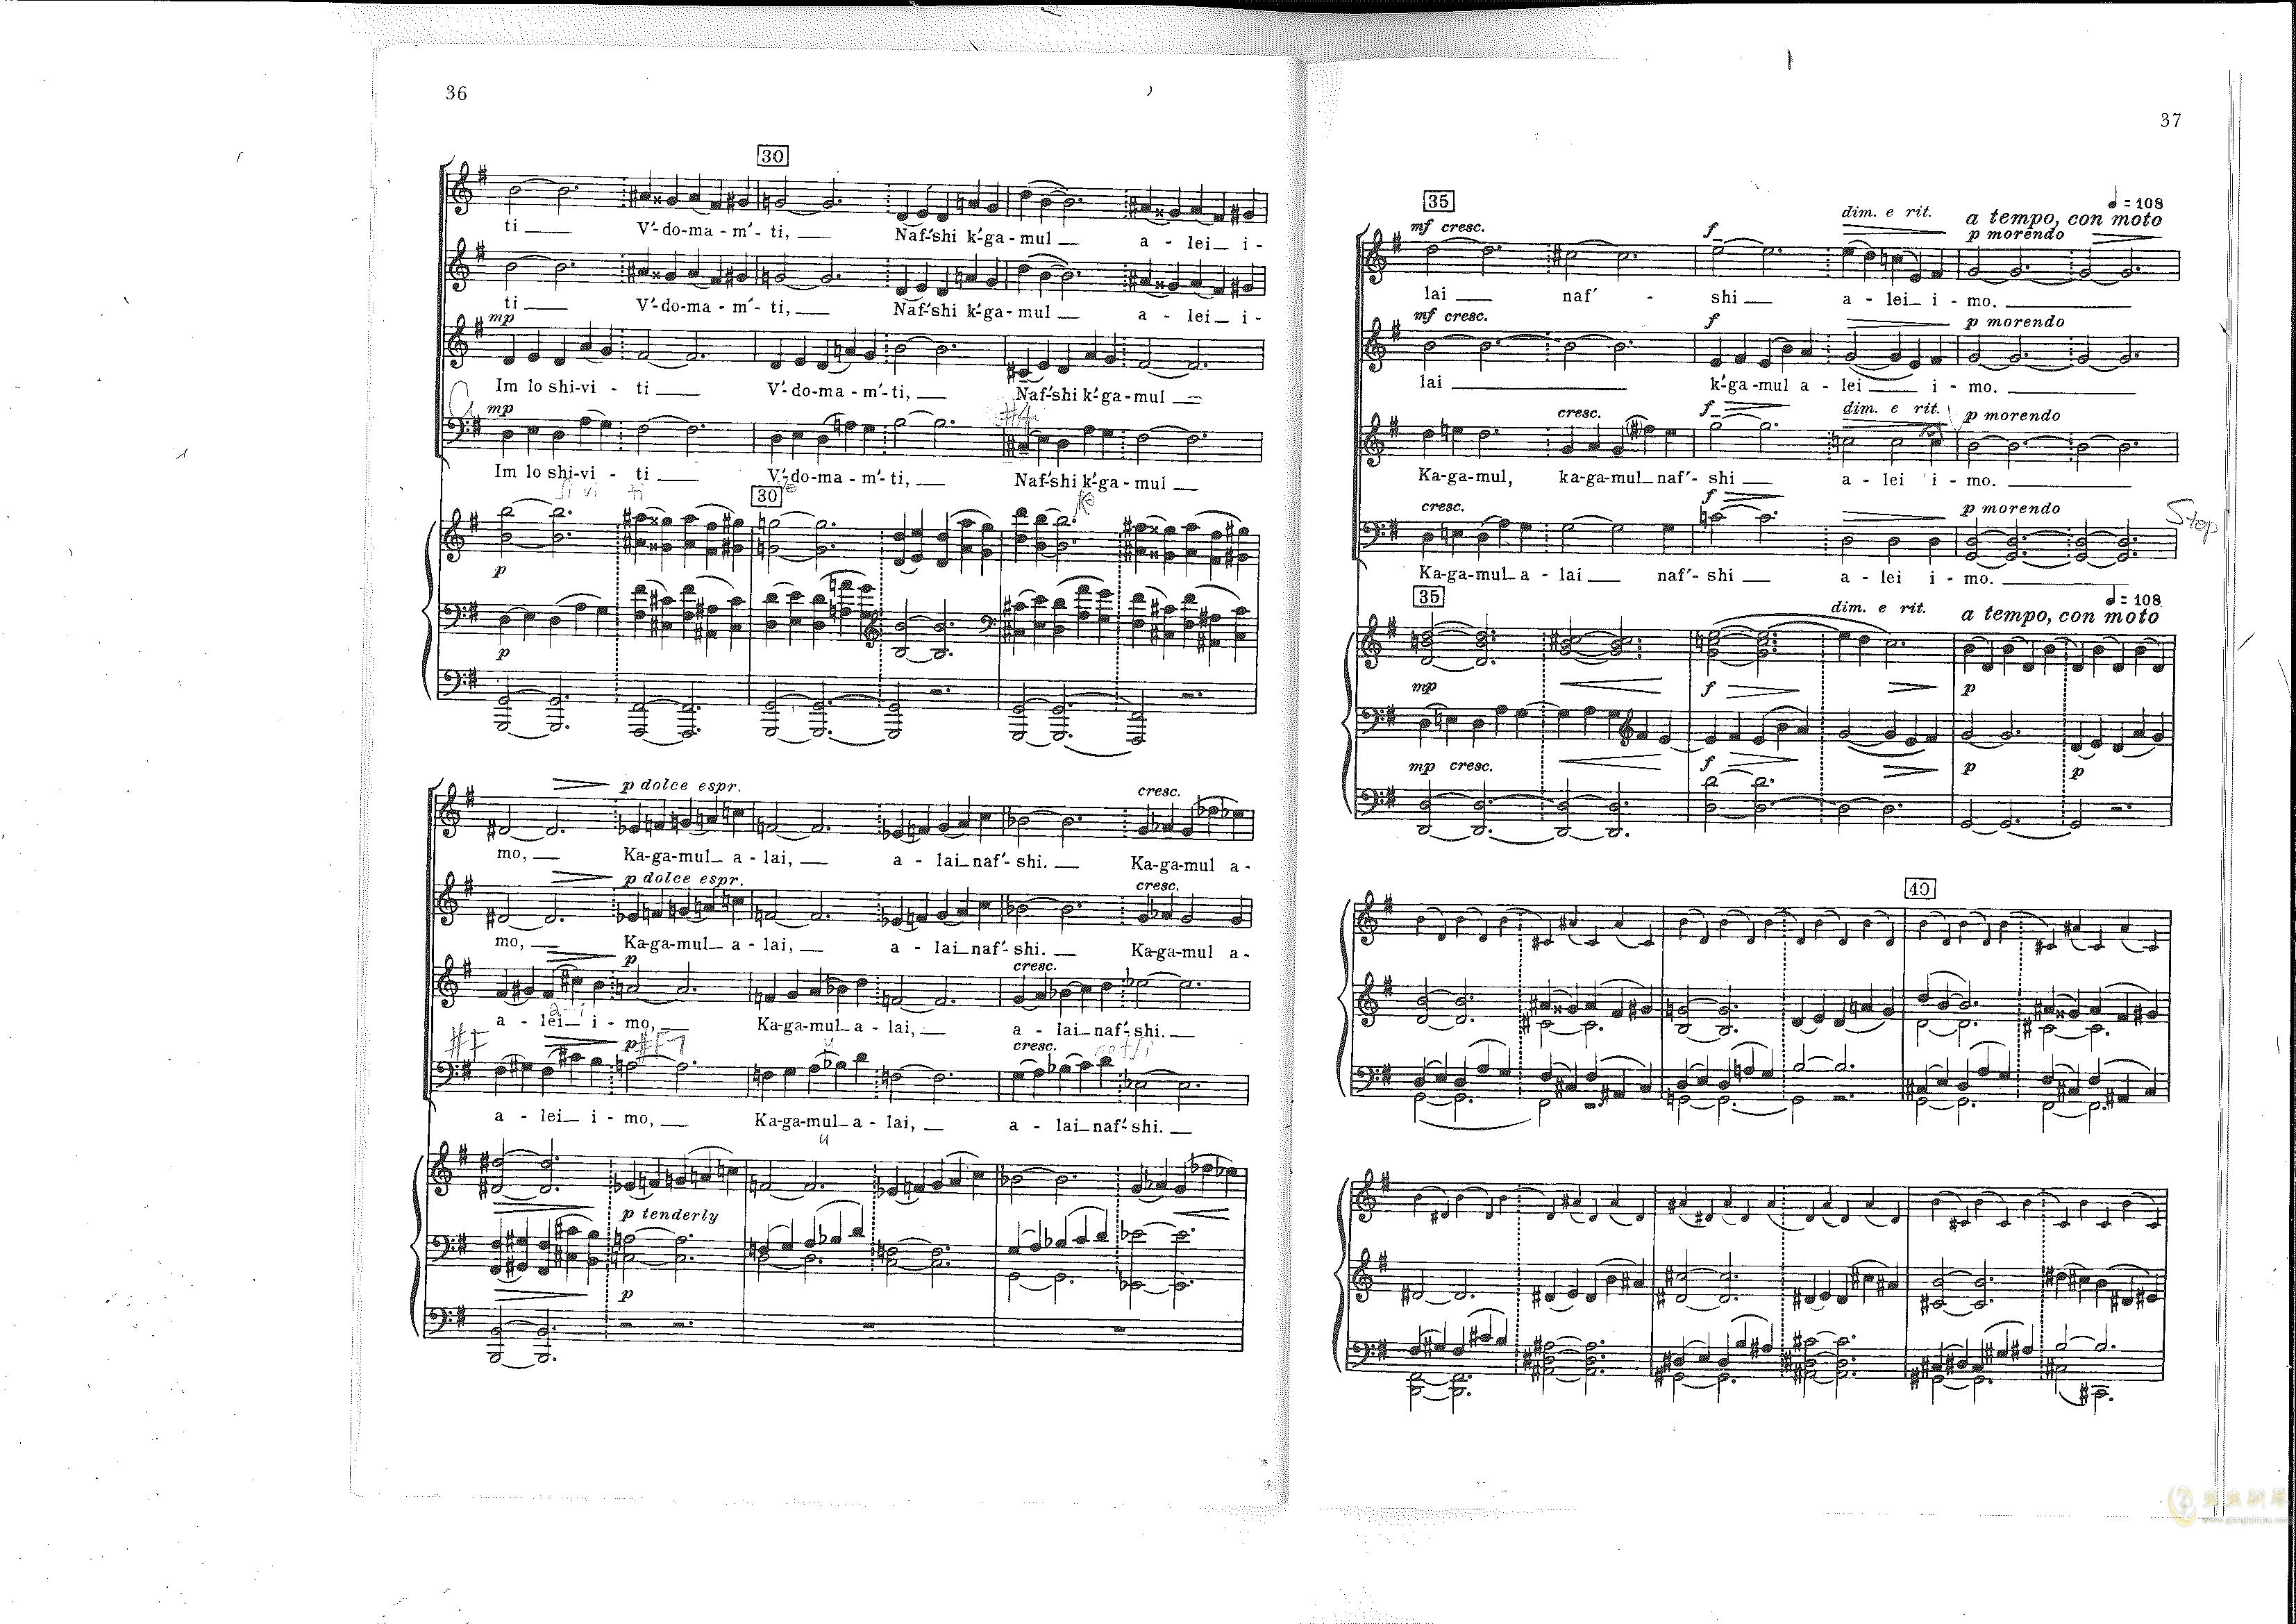 Chichester Psalms澳门星际官网 第22页